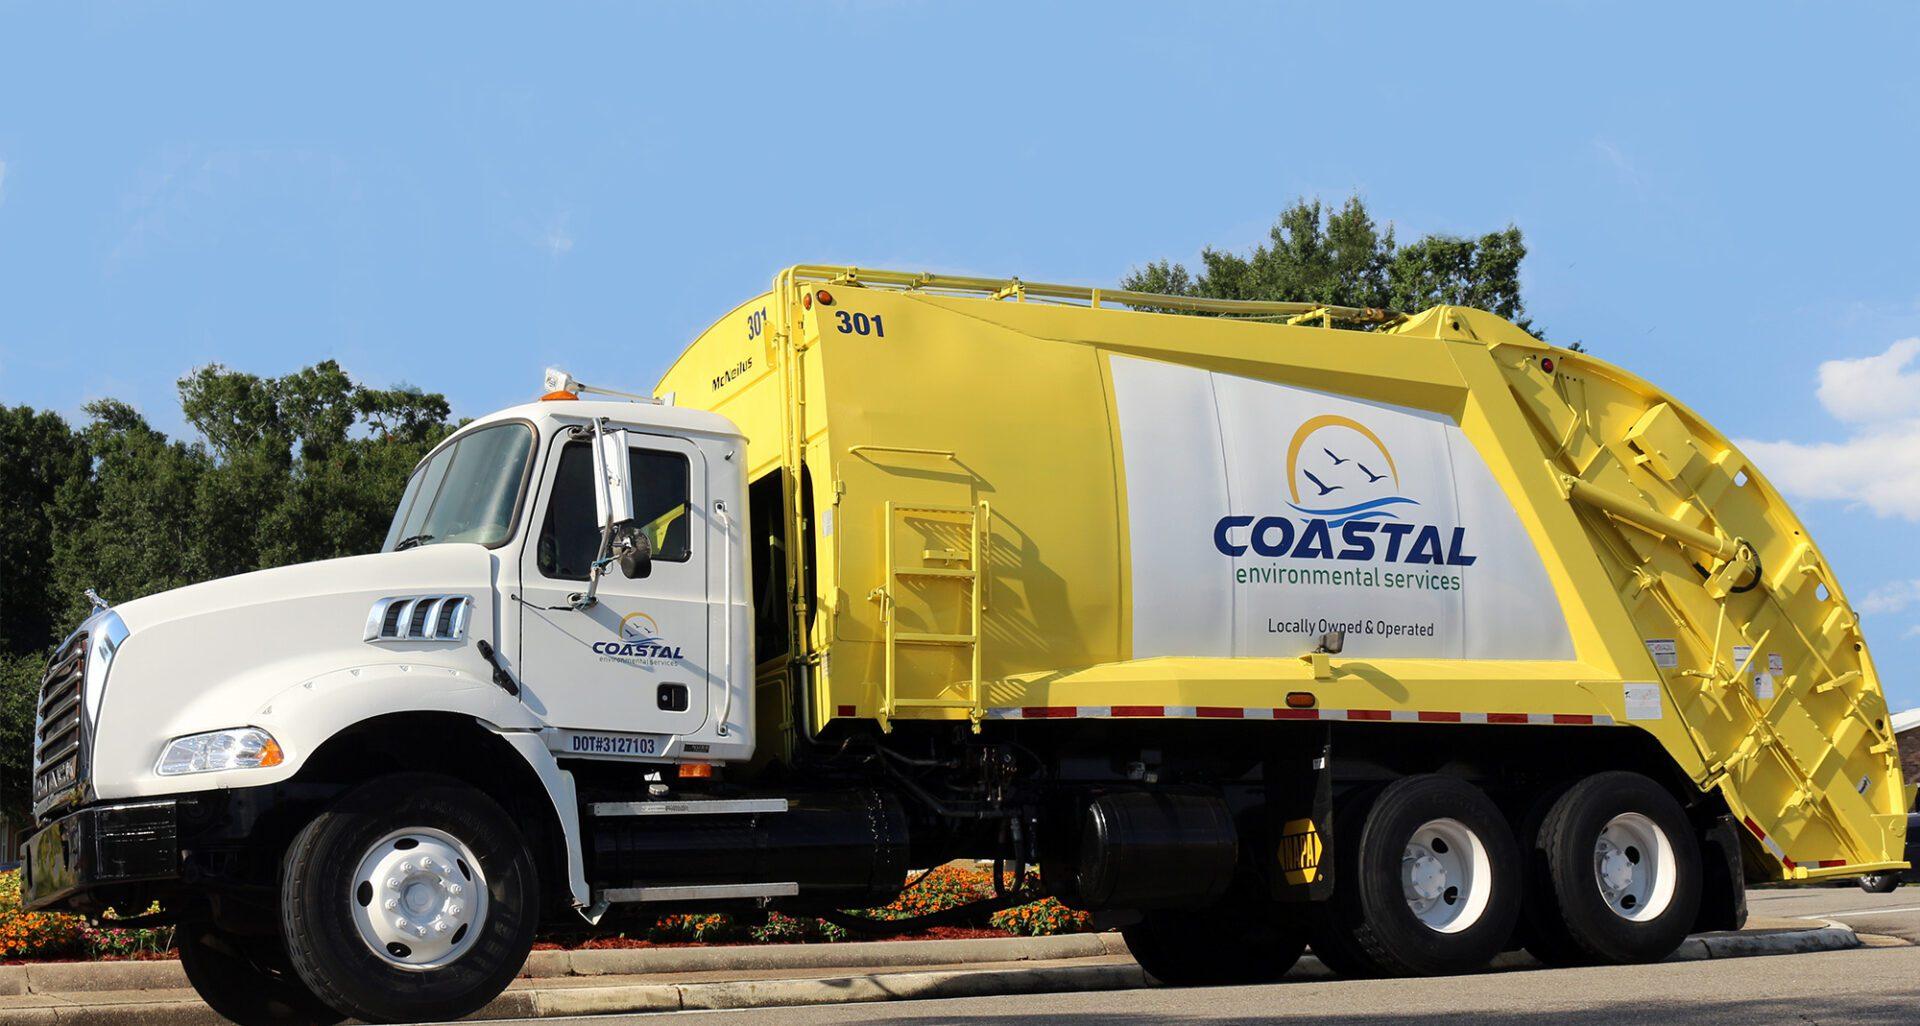 Vehicle graphics Coastal Environmental Services